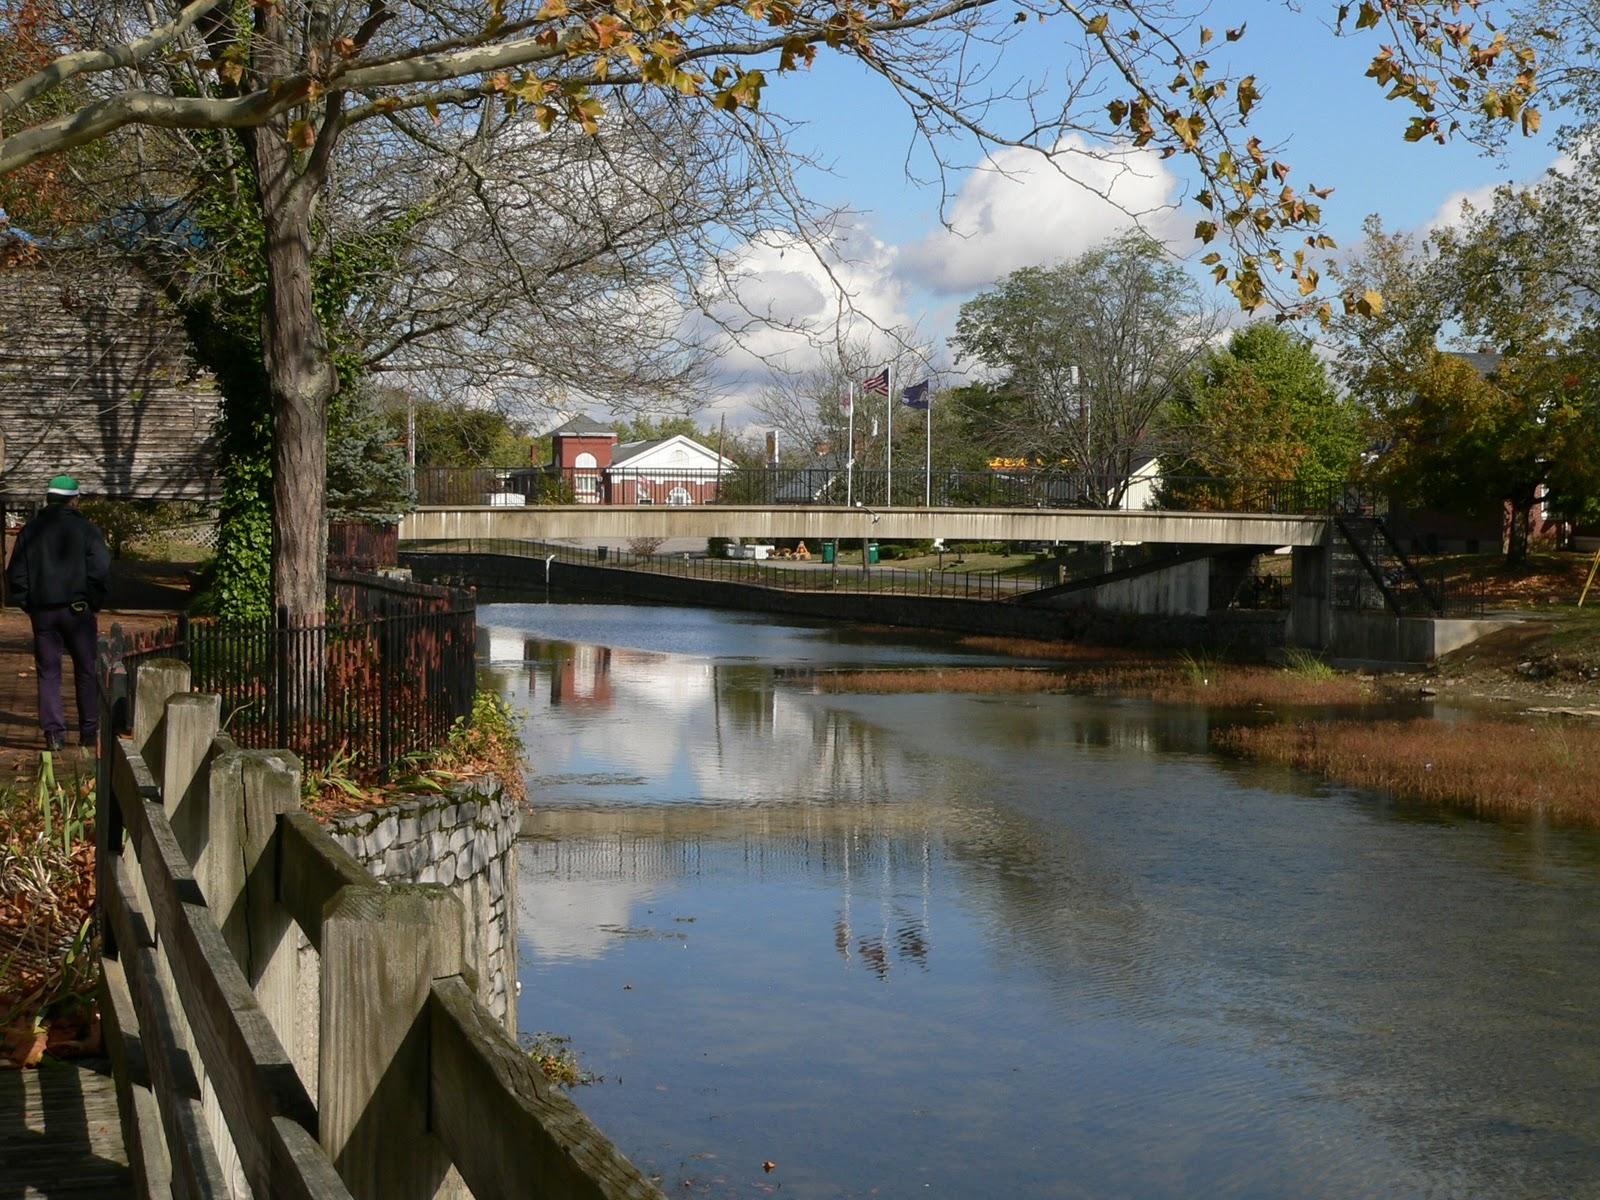 http://1.bp.blogspot.com/_L78zEKWCMII/TTDmUHuwazI/AAAAAAAABWQ/f3oGqR7zMdo/s1600/Where+is+Teemo+-+River+Scene.JPG